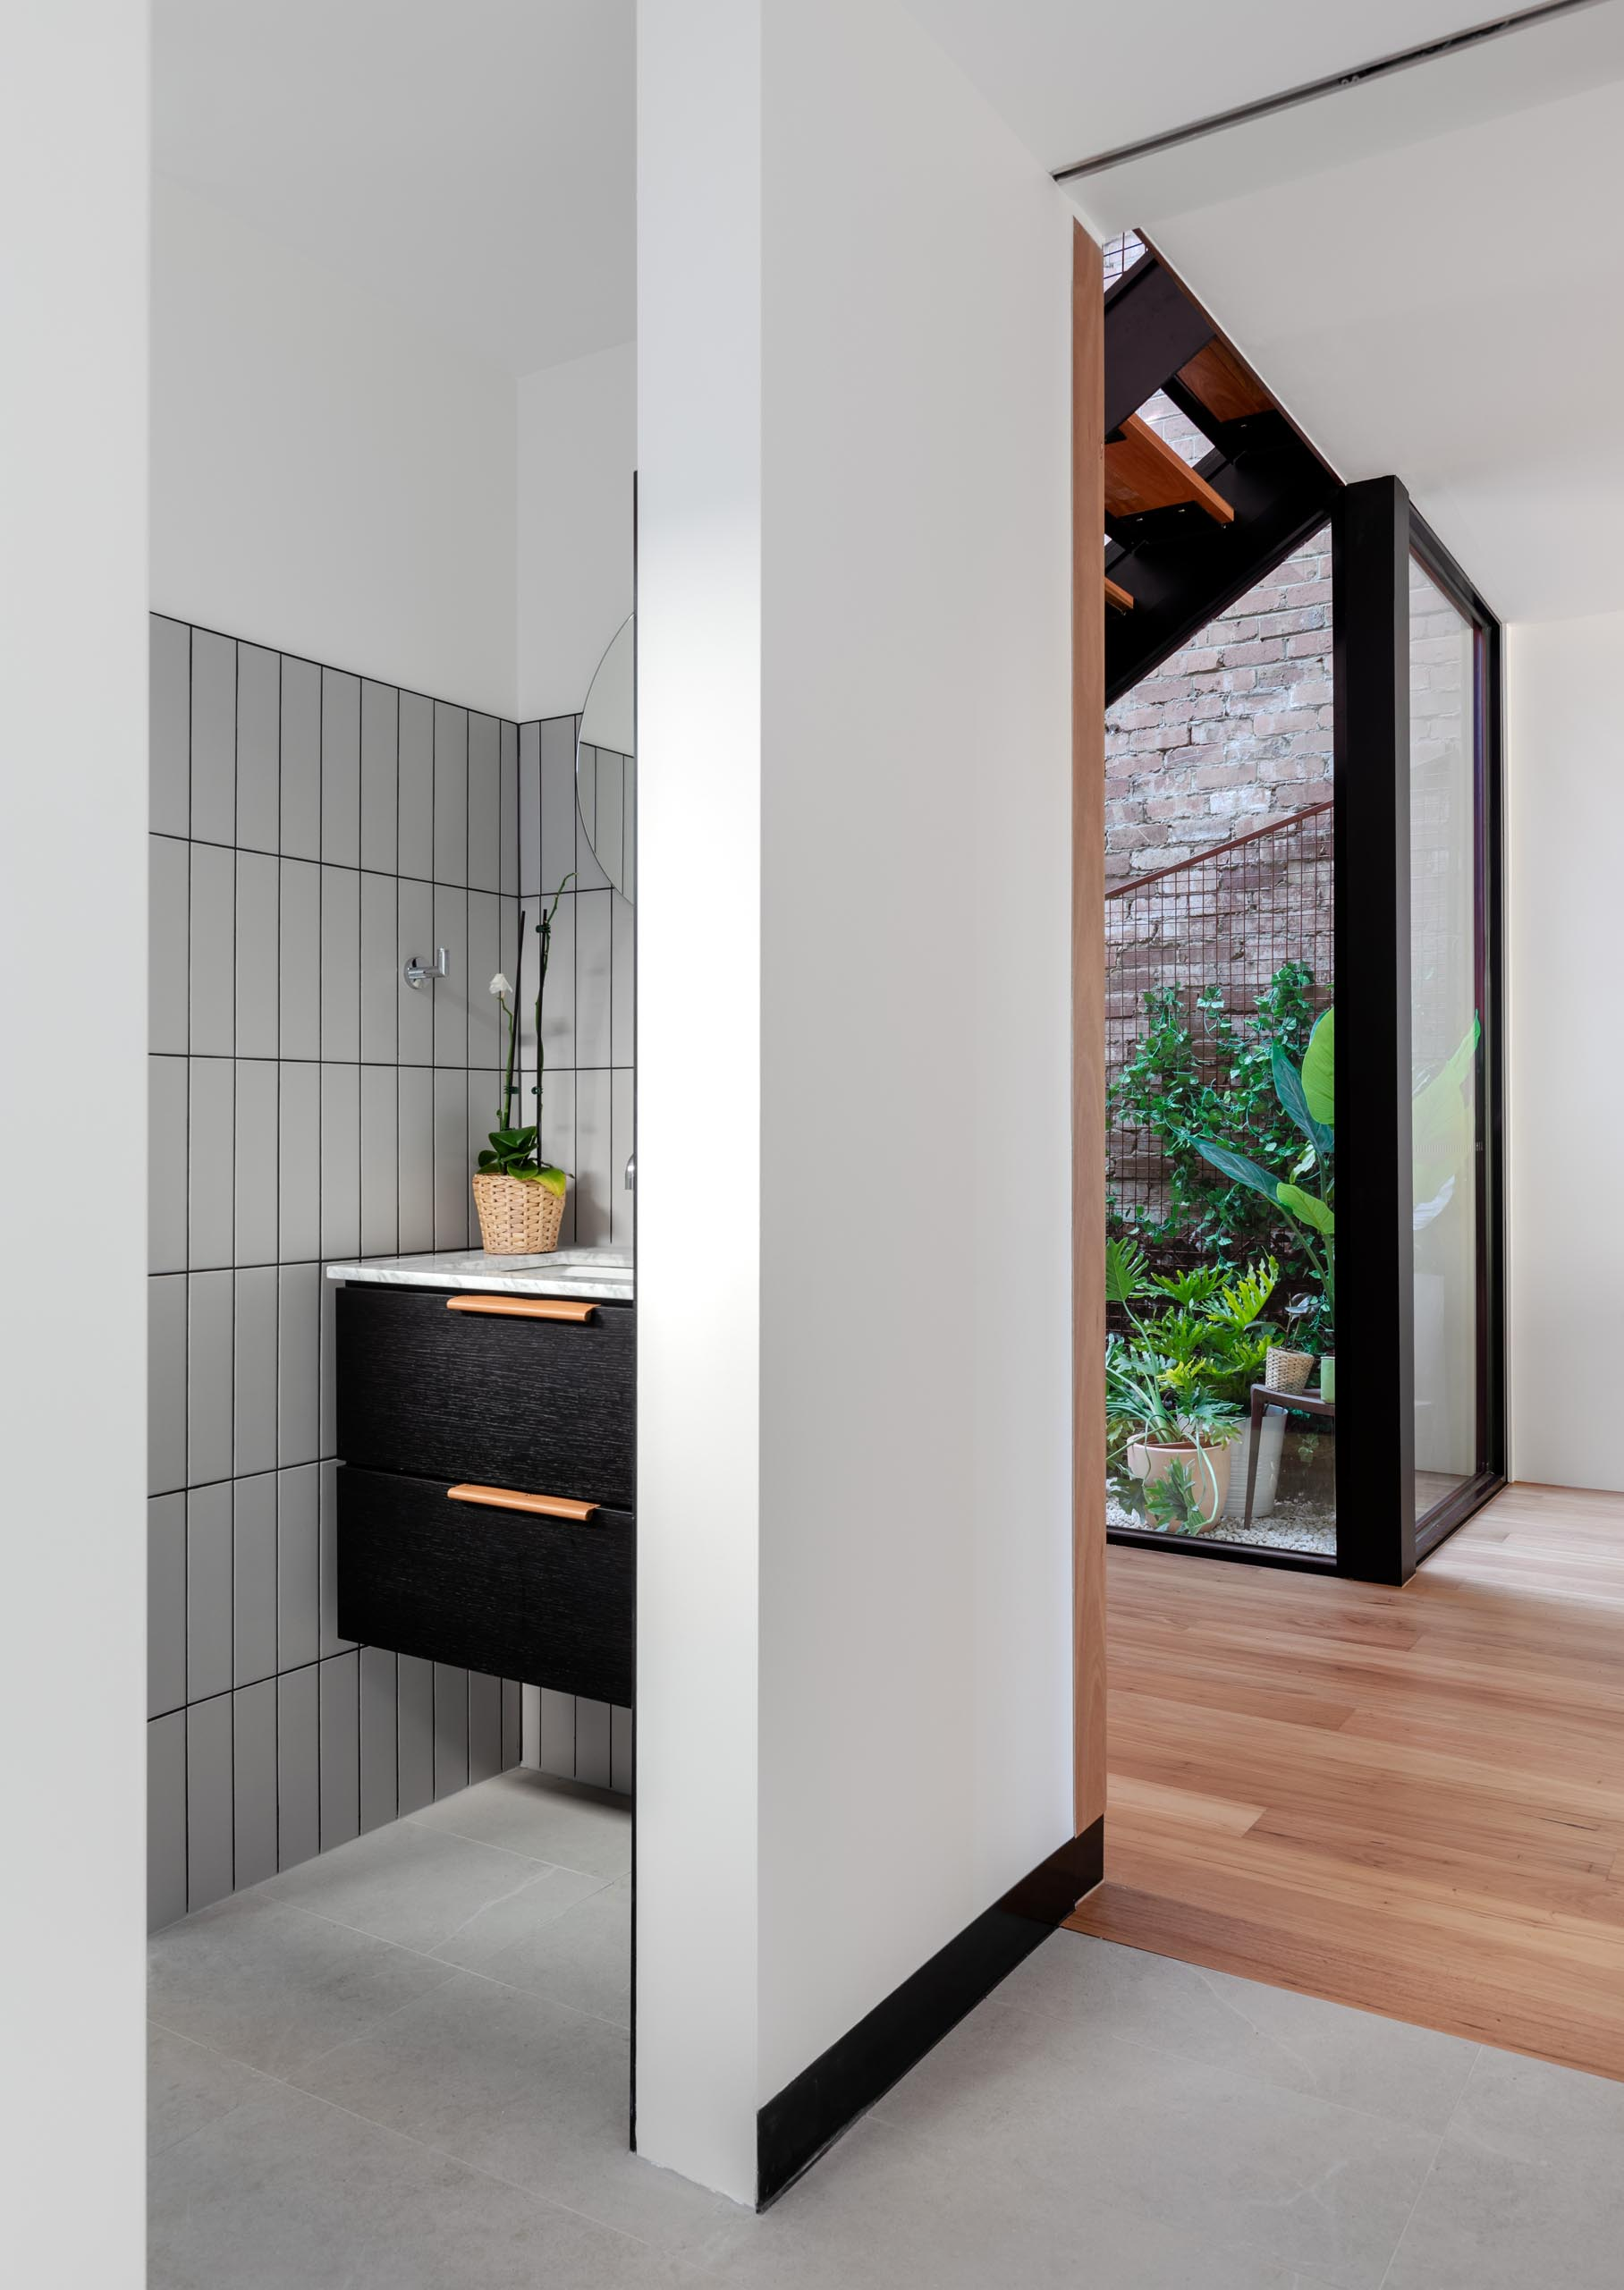 A modern bathroom with light gray rectangular tiles and a black vanity.